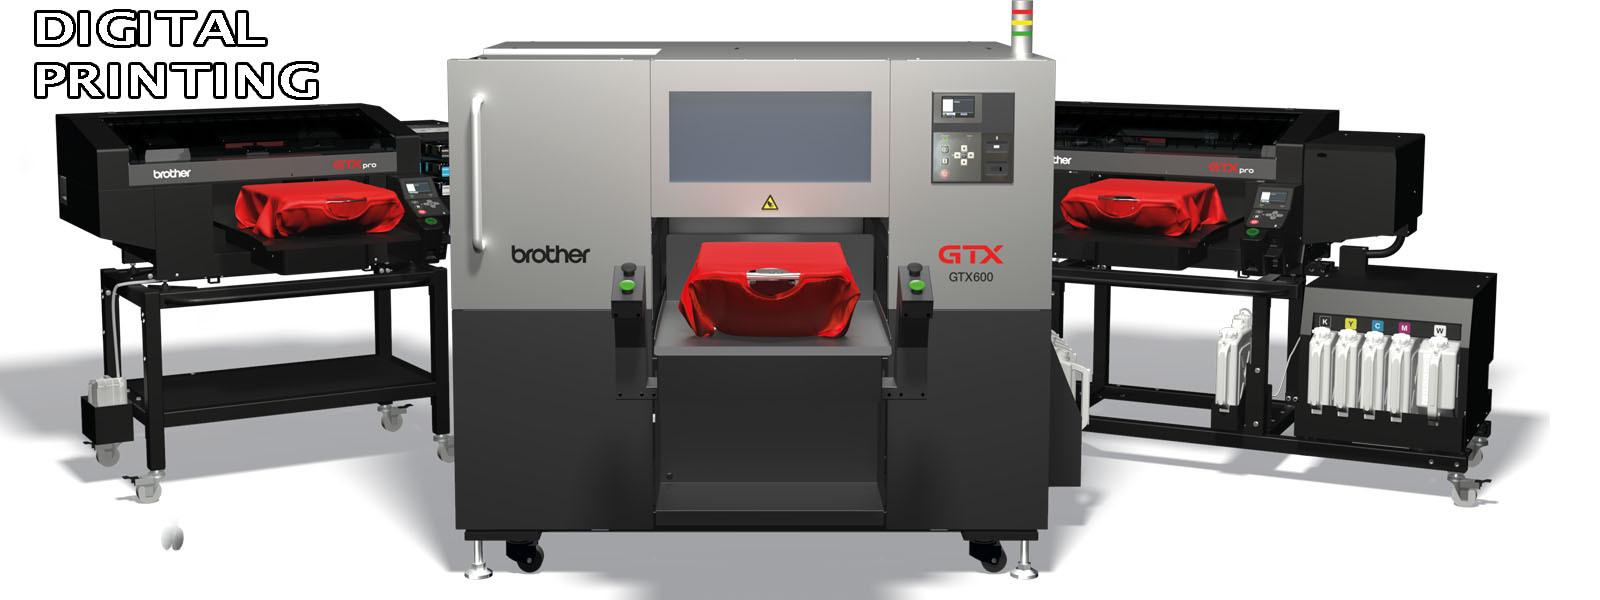 Printing And Digital Supplies Machine Screen qzMGUpSV